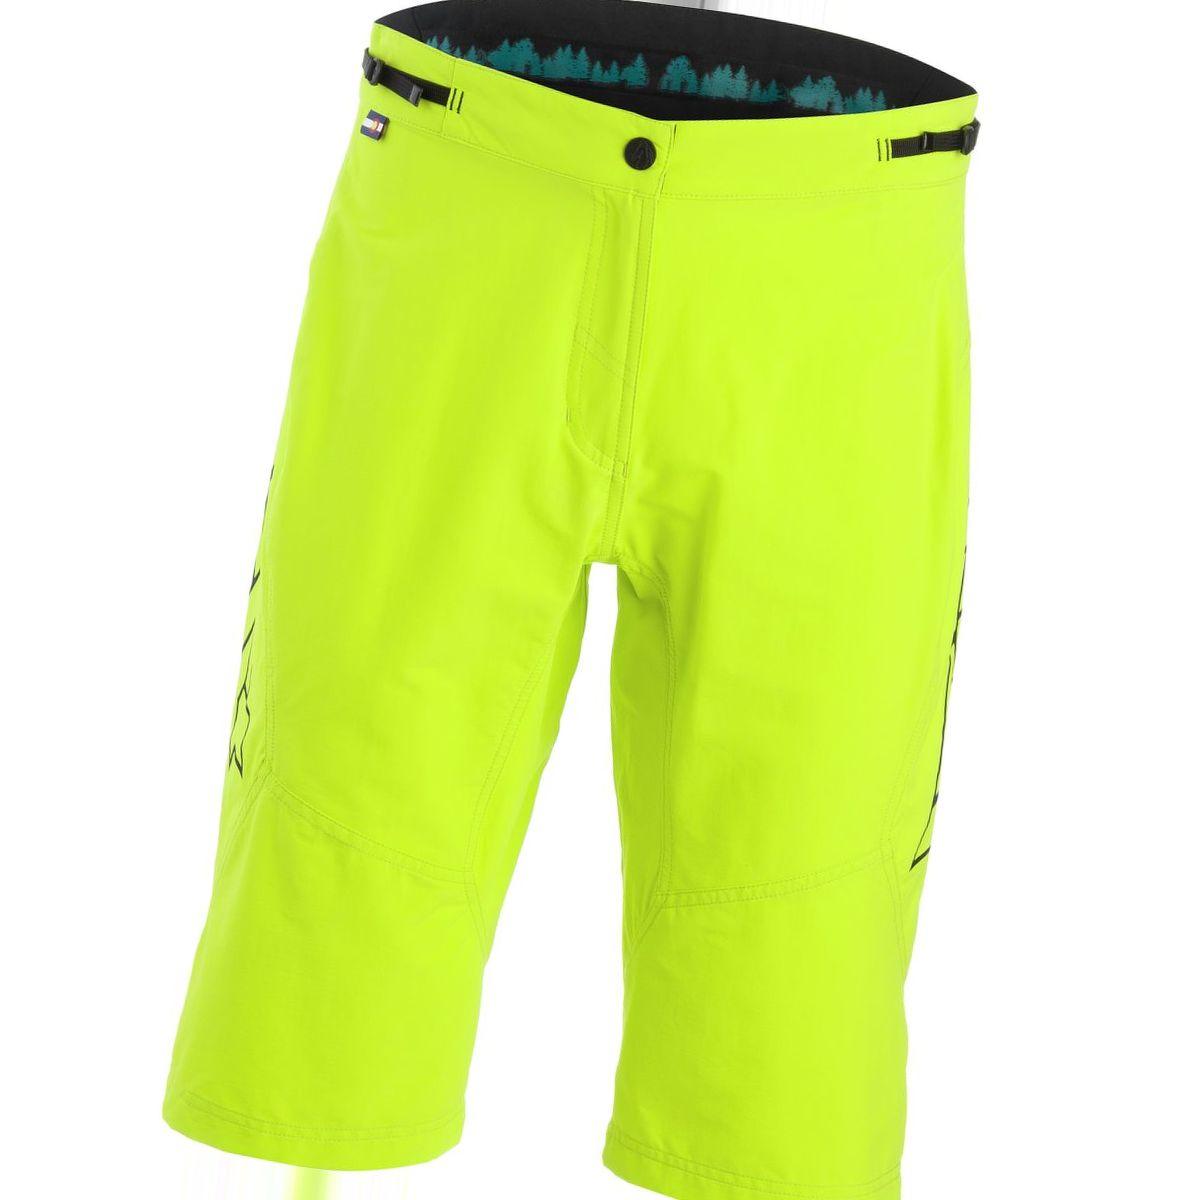 Yeti Cycles Enduro Short - Men's